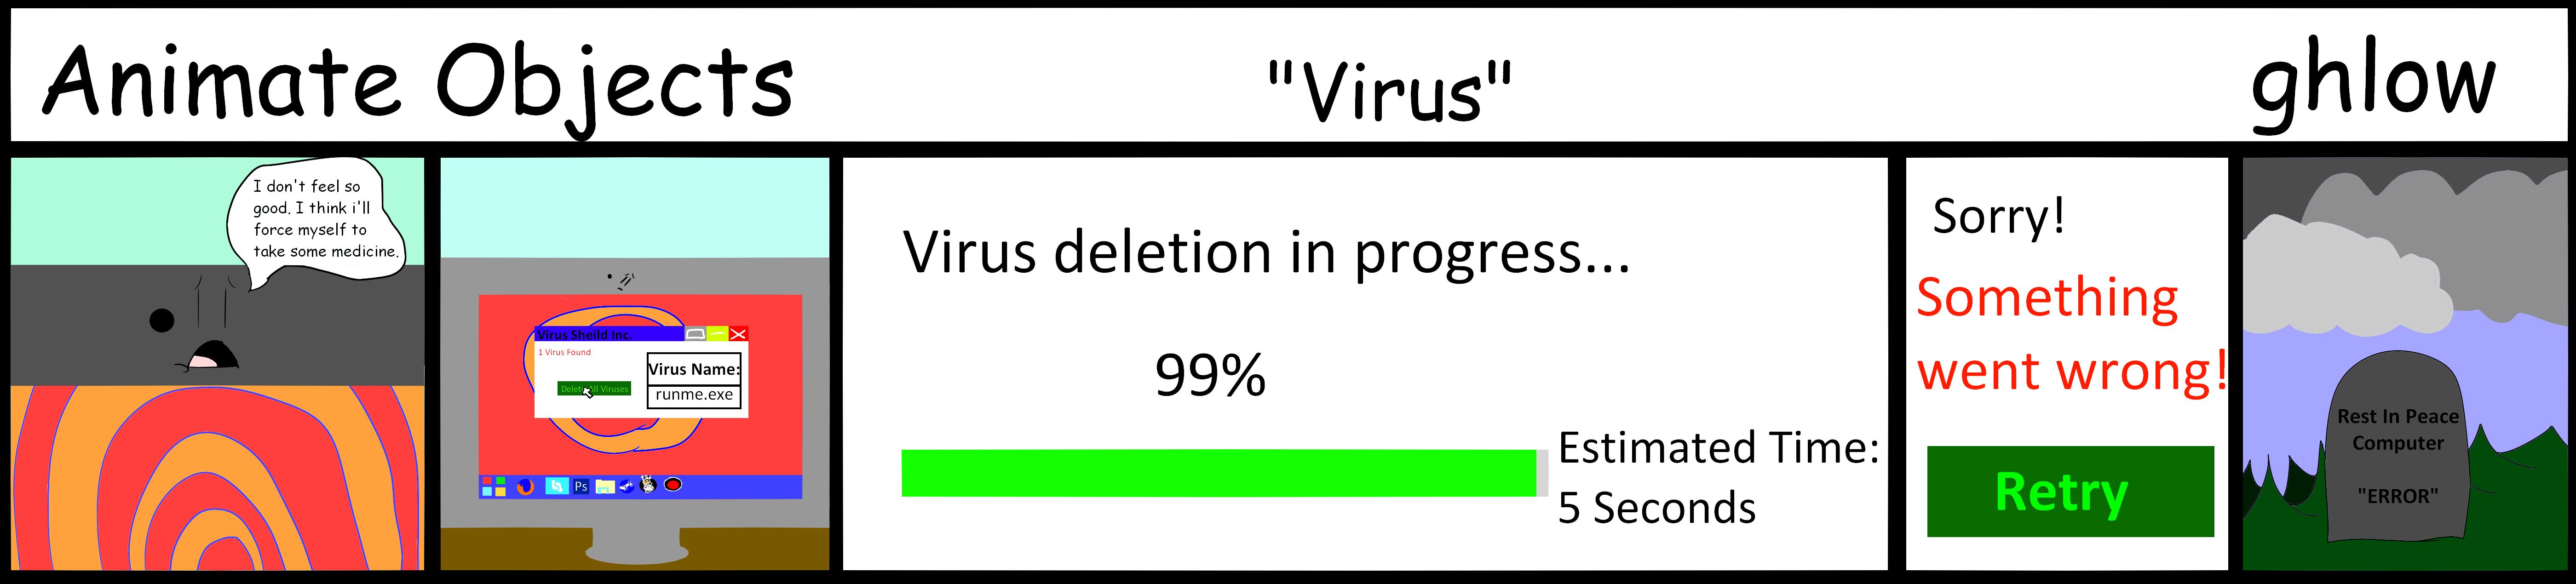 Animate Objects - Virus